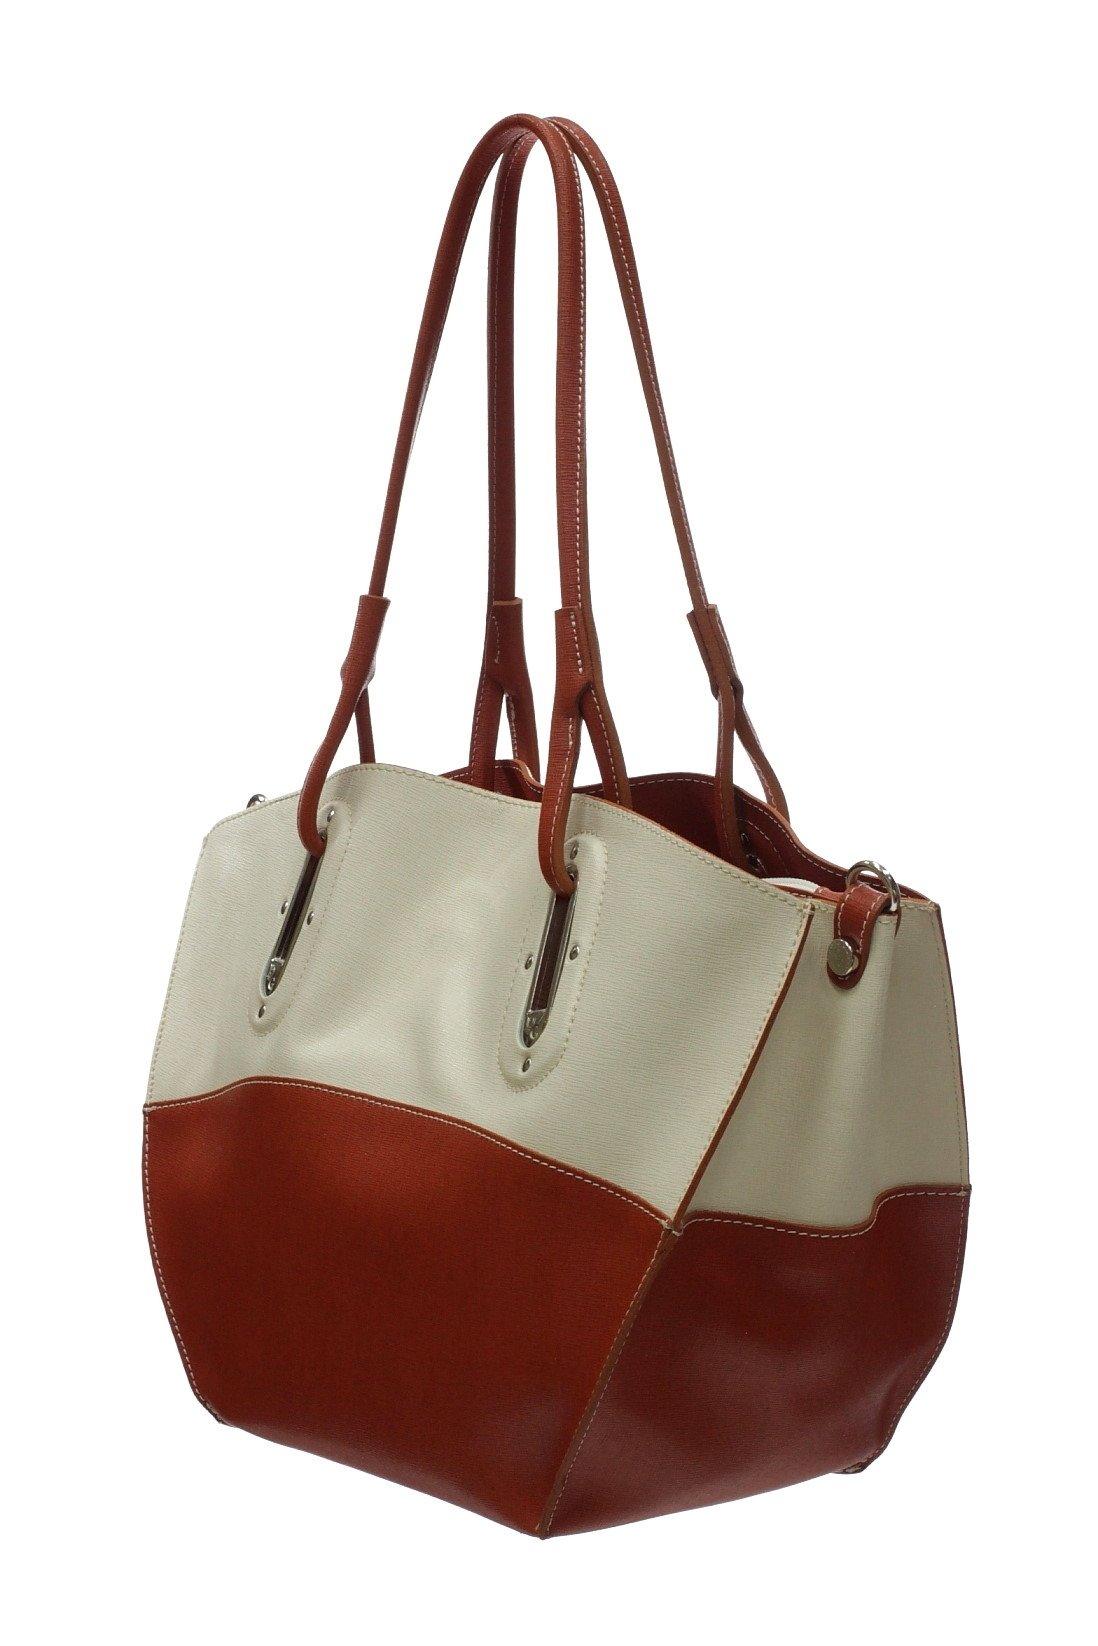 СУМКИ ИЗ КОЖИ СКАТА и женские сумочки покупайте в